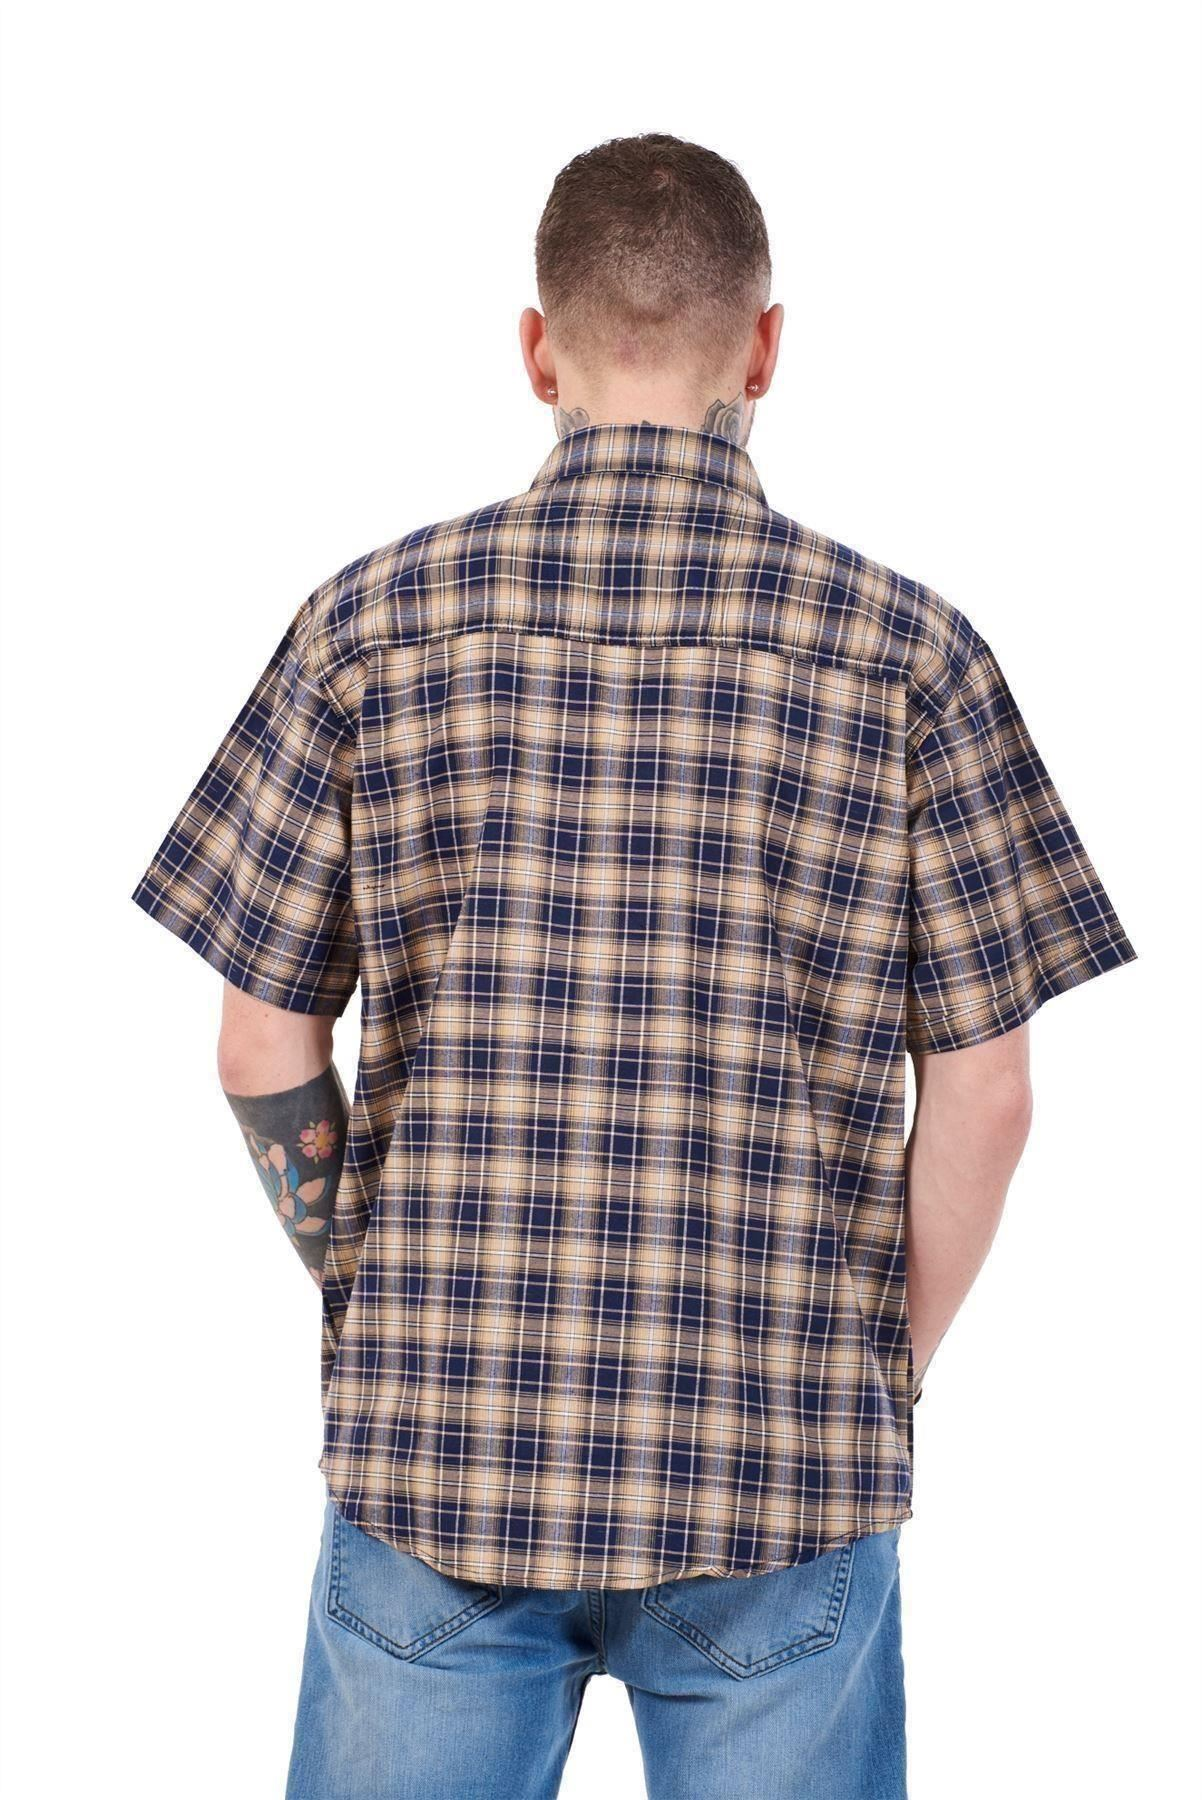 Mens-Regular-Big-Size-Shirts-Checked-Cotton-Blend-Casual-Short-Sleeve-Blue-M-5XL thumbnail 12